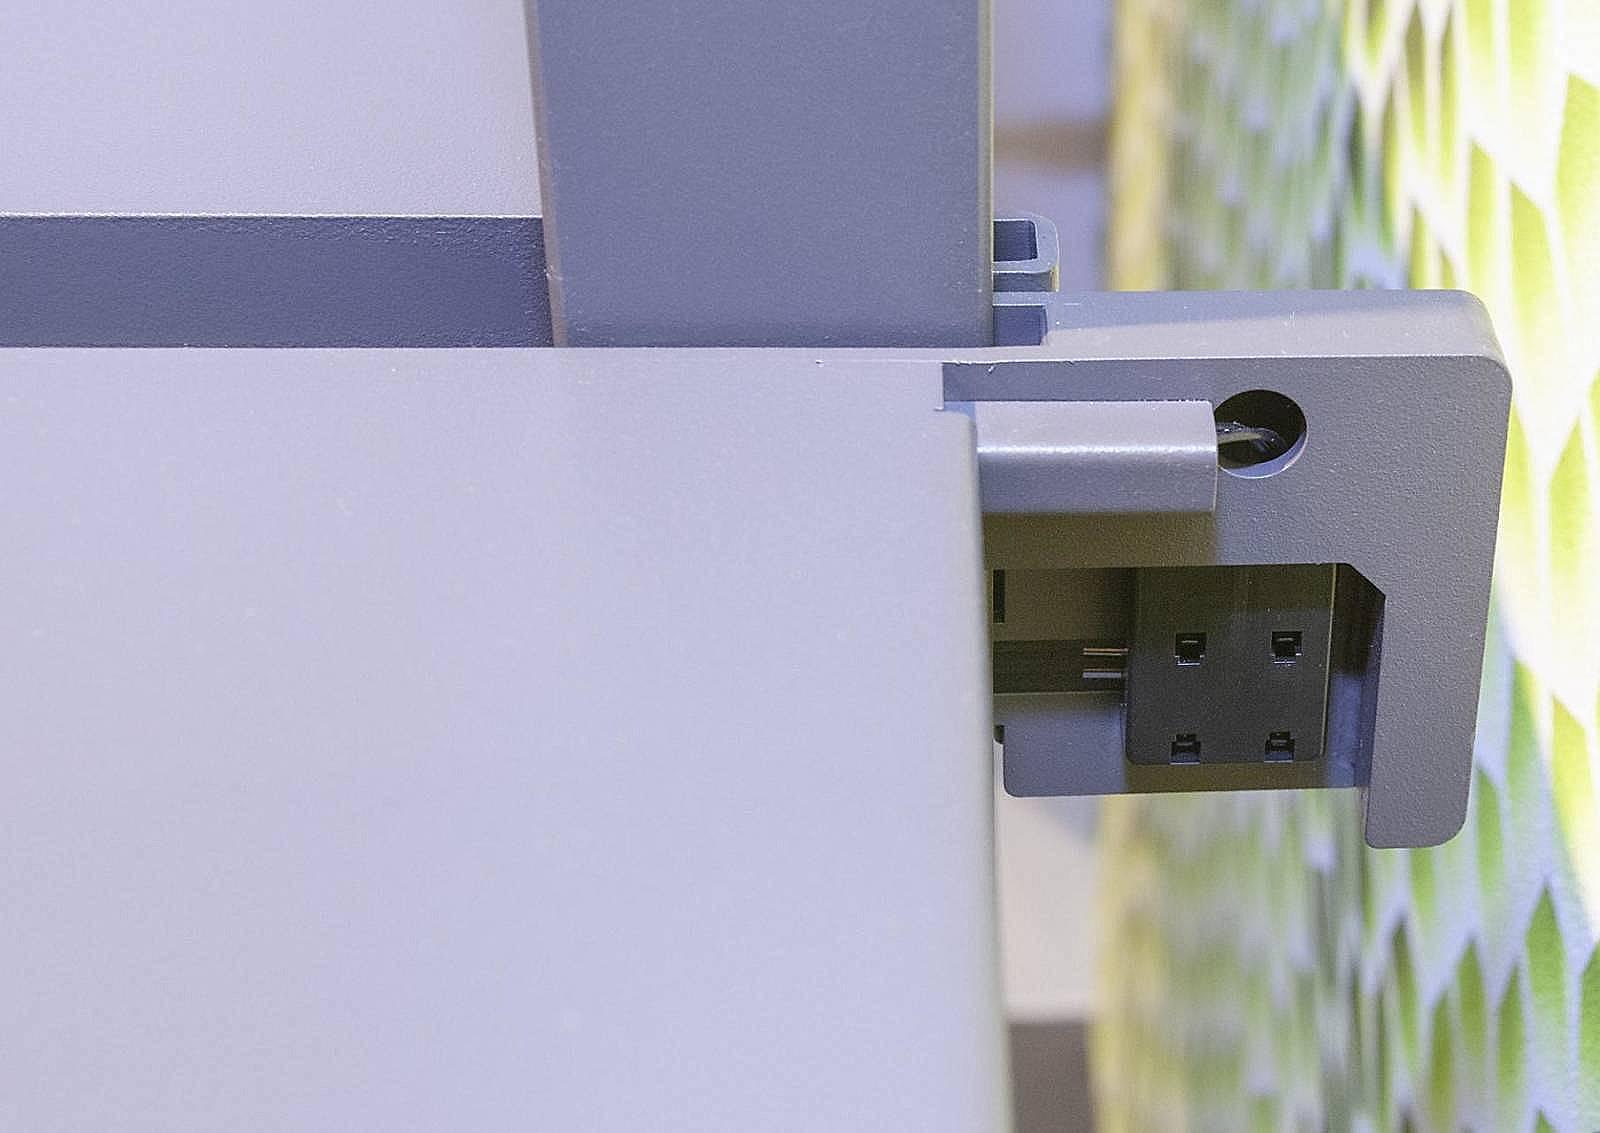 System verso - KRAISS systems